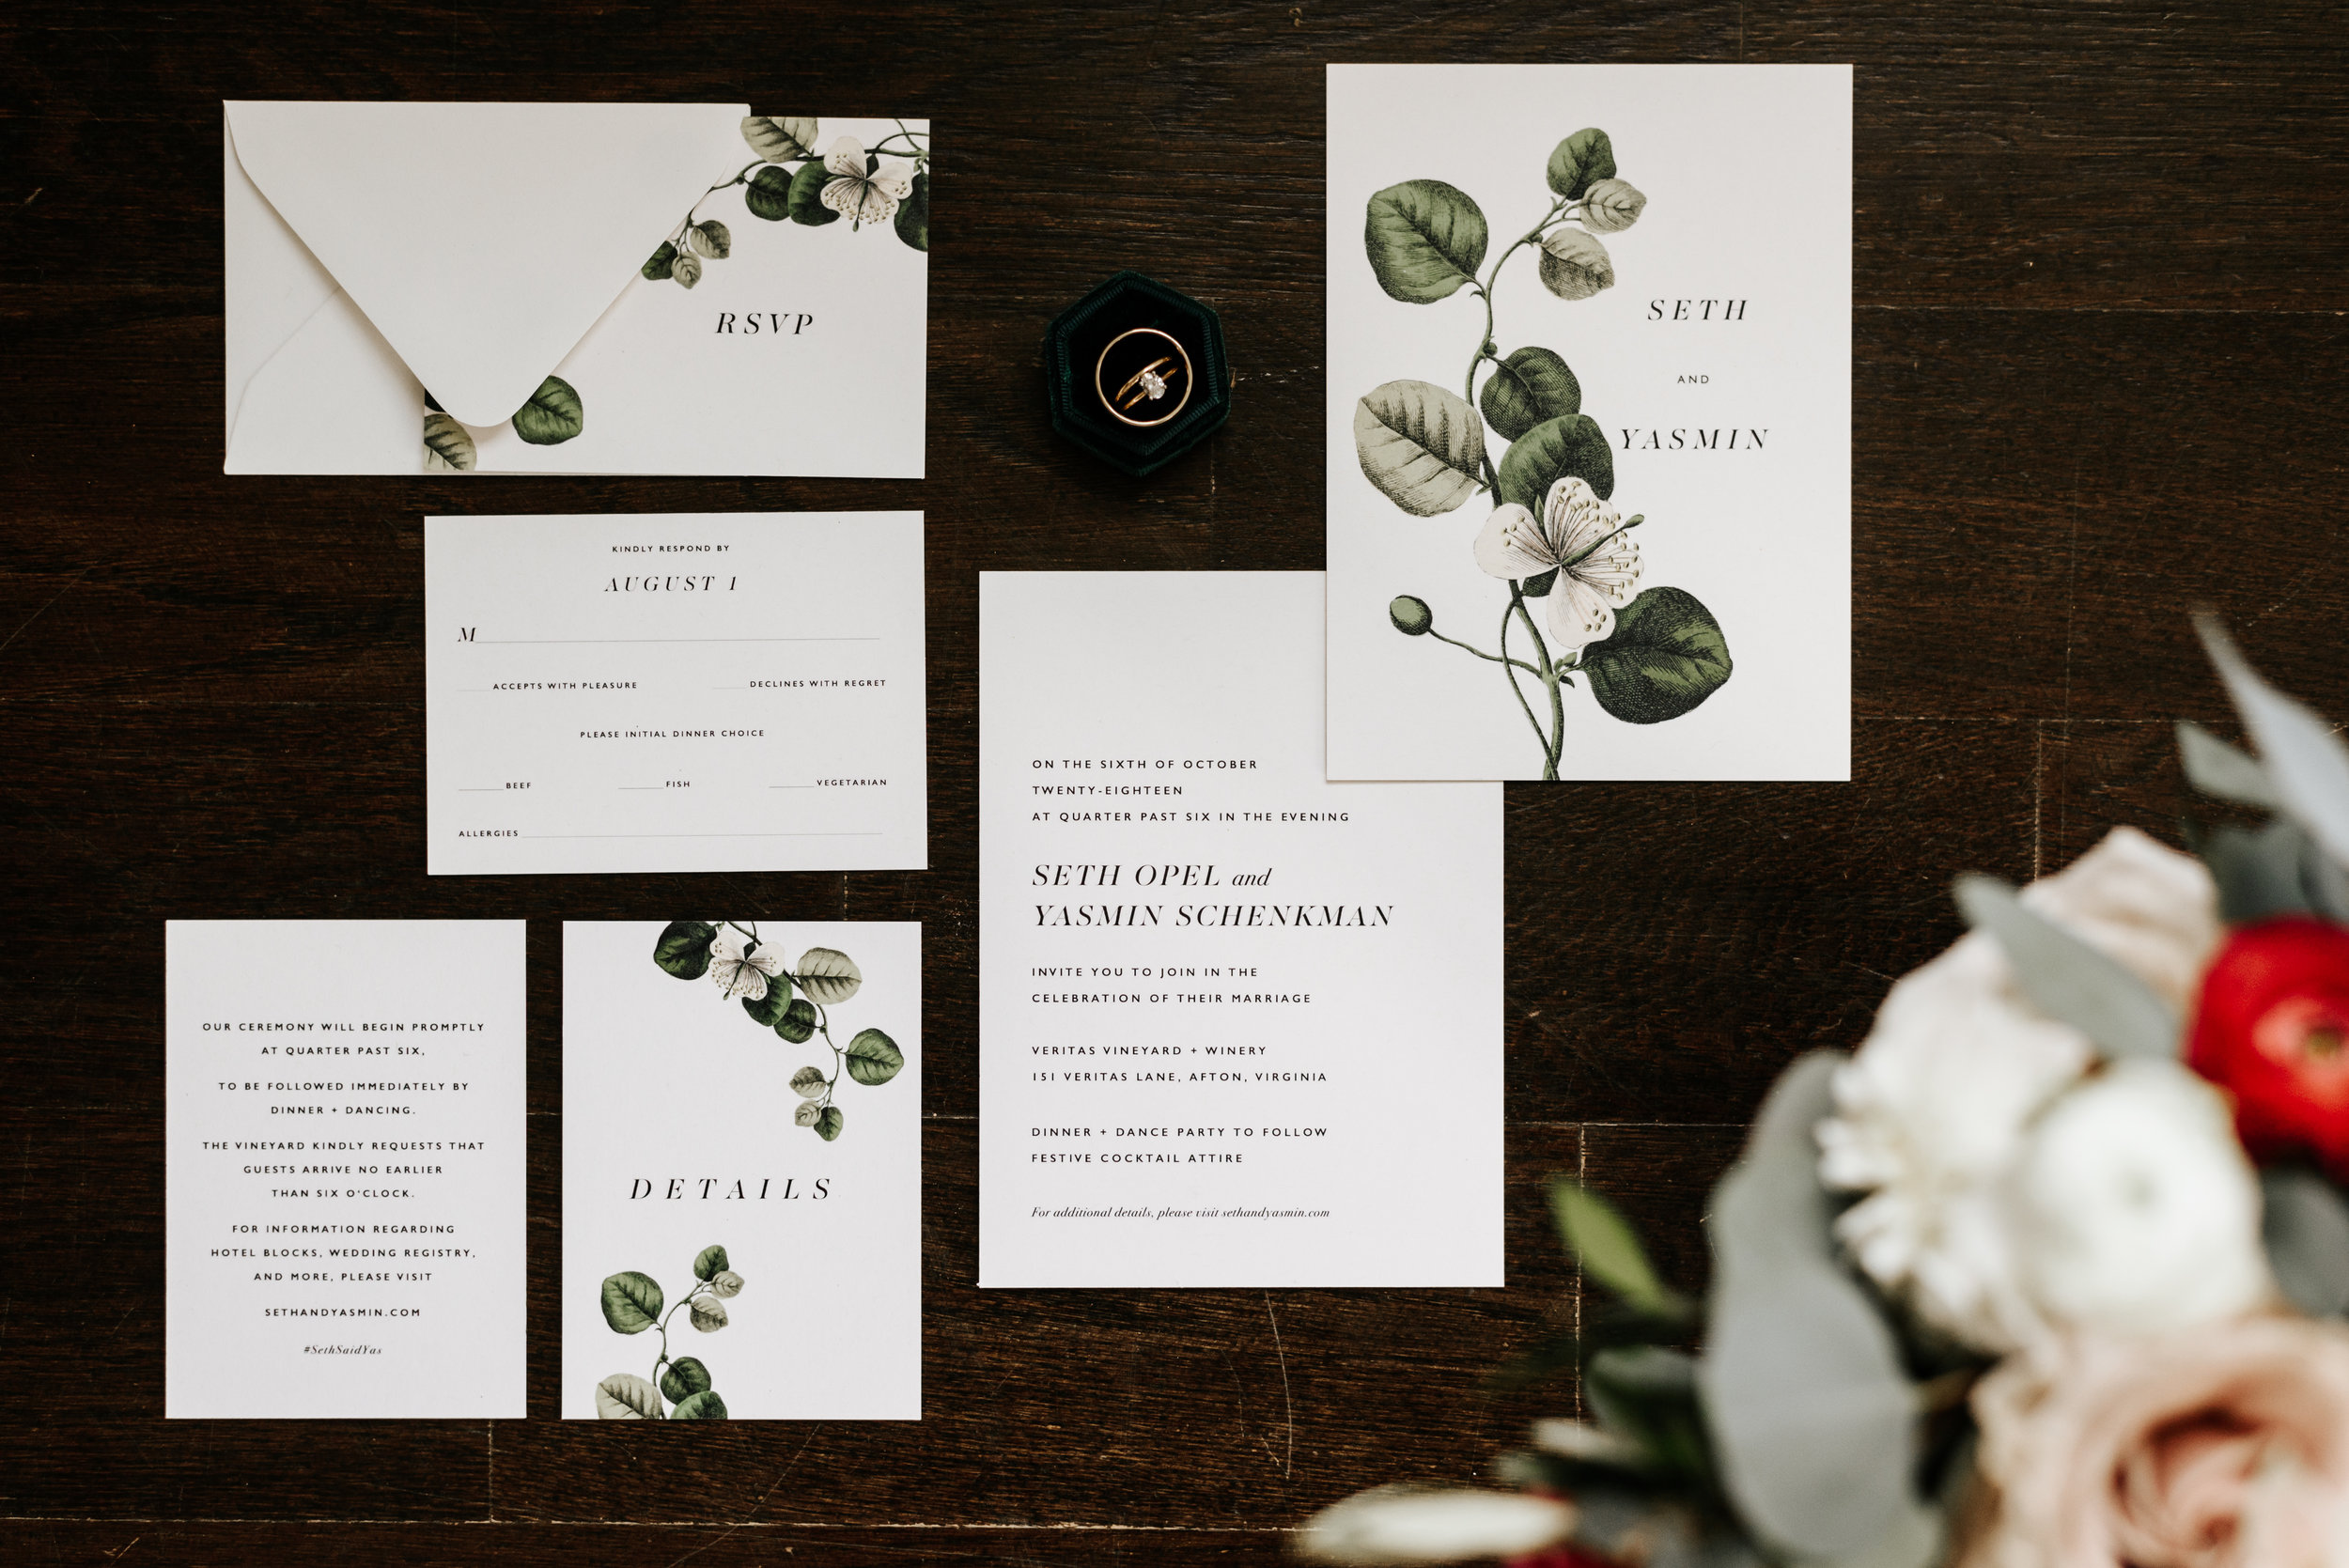 Veritas-Vineyards-and-Winery-Wedding-Photography-Afton-Virginia-Yasmin-Seth-Photography-by-V-9007.jpg